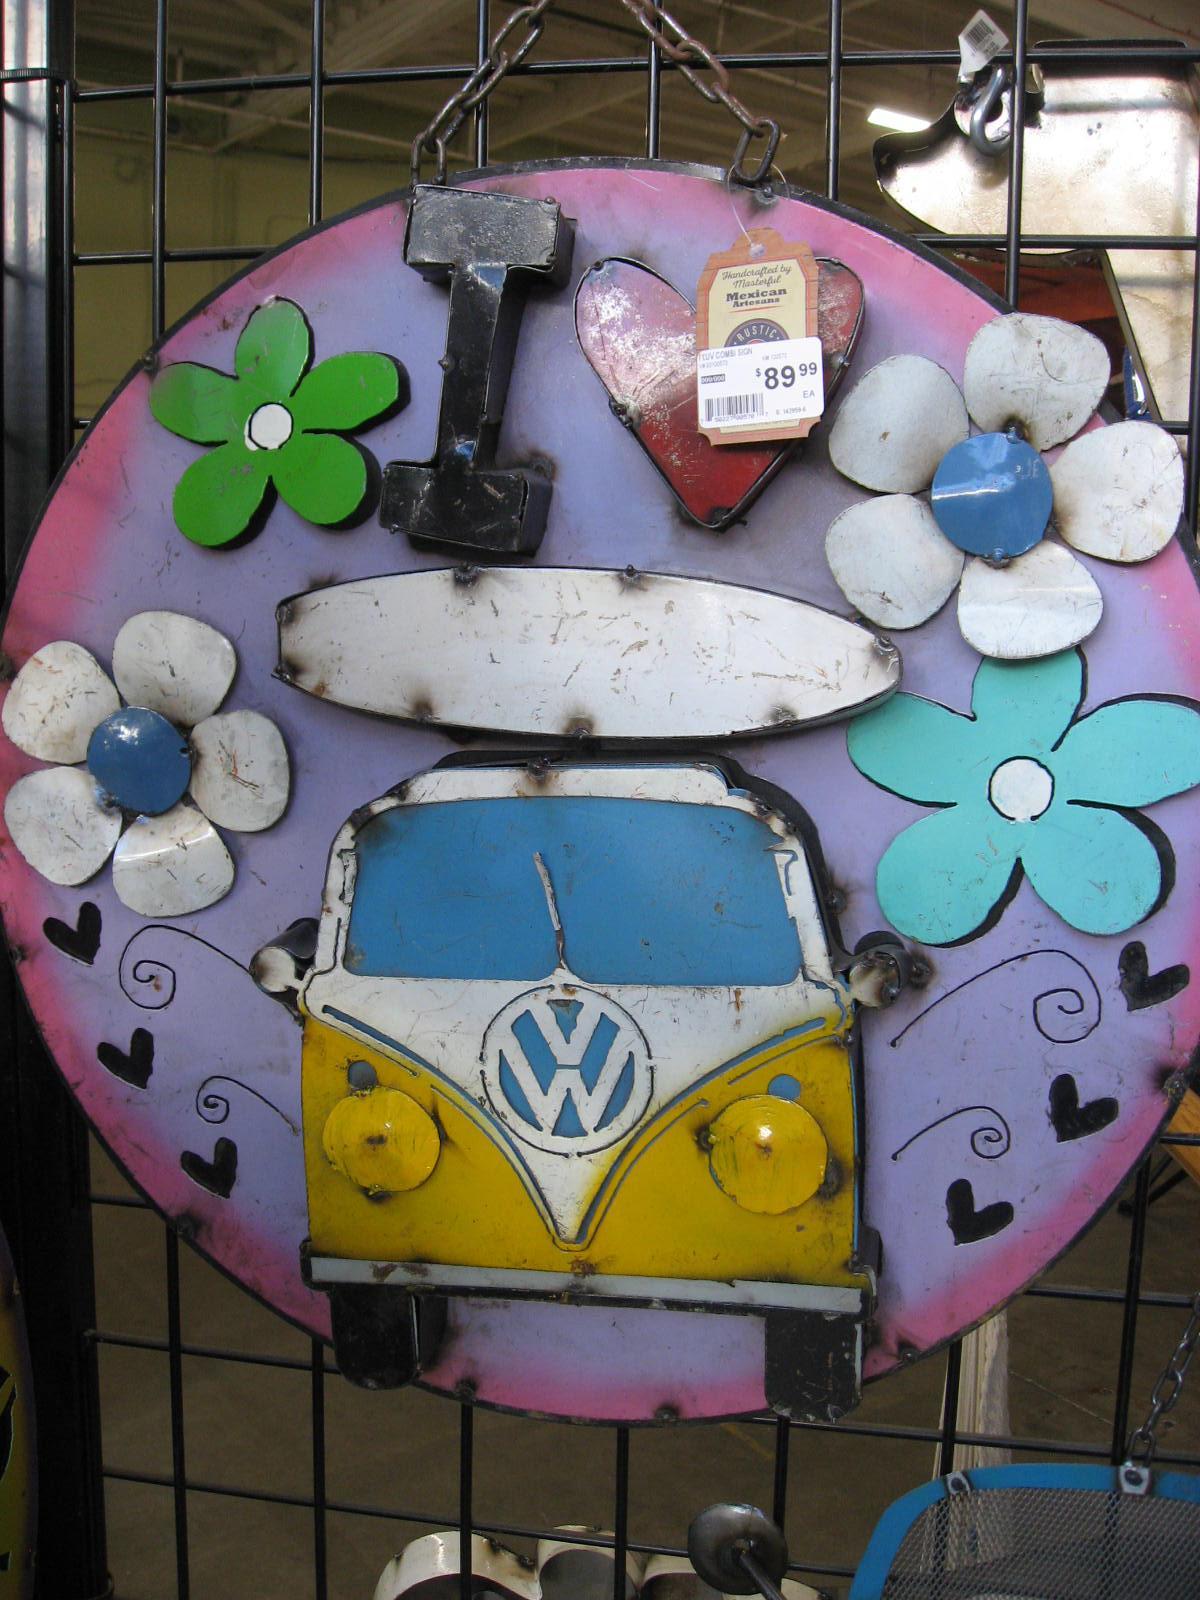 VW bus yard art